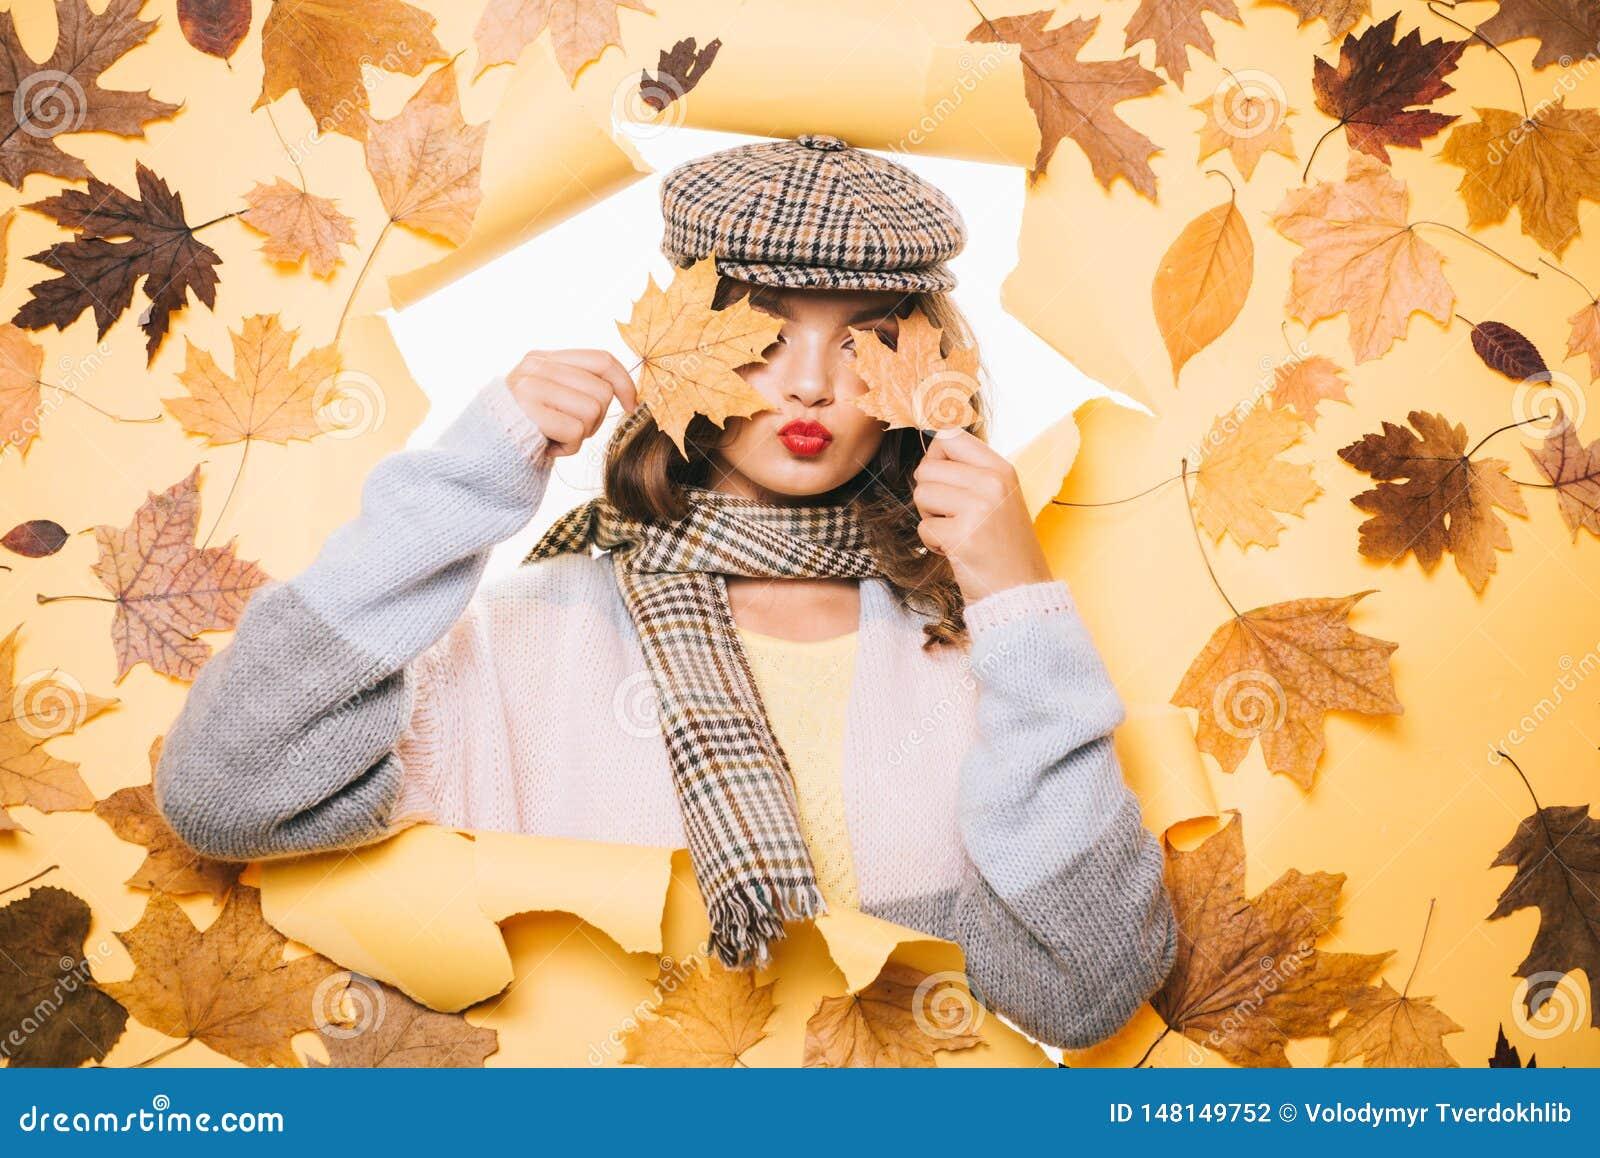 Fashionable cutie. Pretty woman wear autumn fashion accessories. Casual fashion trends for fall. Fashion girl look